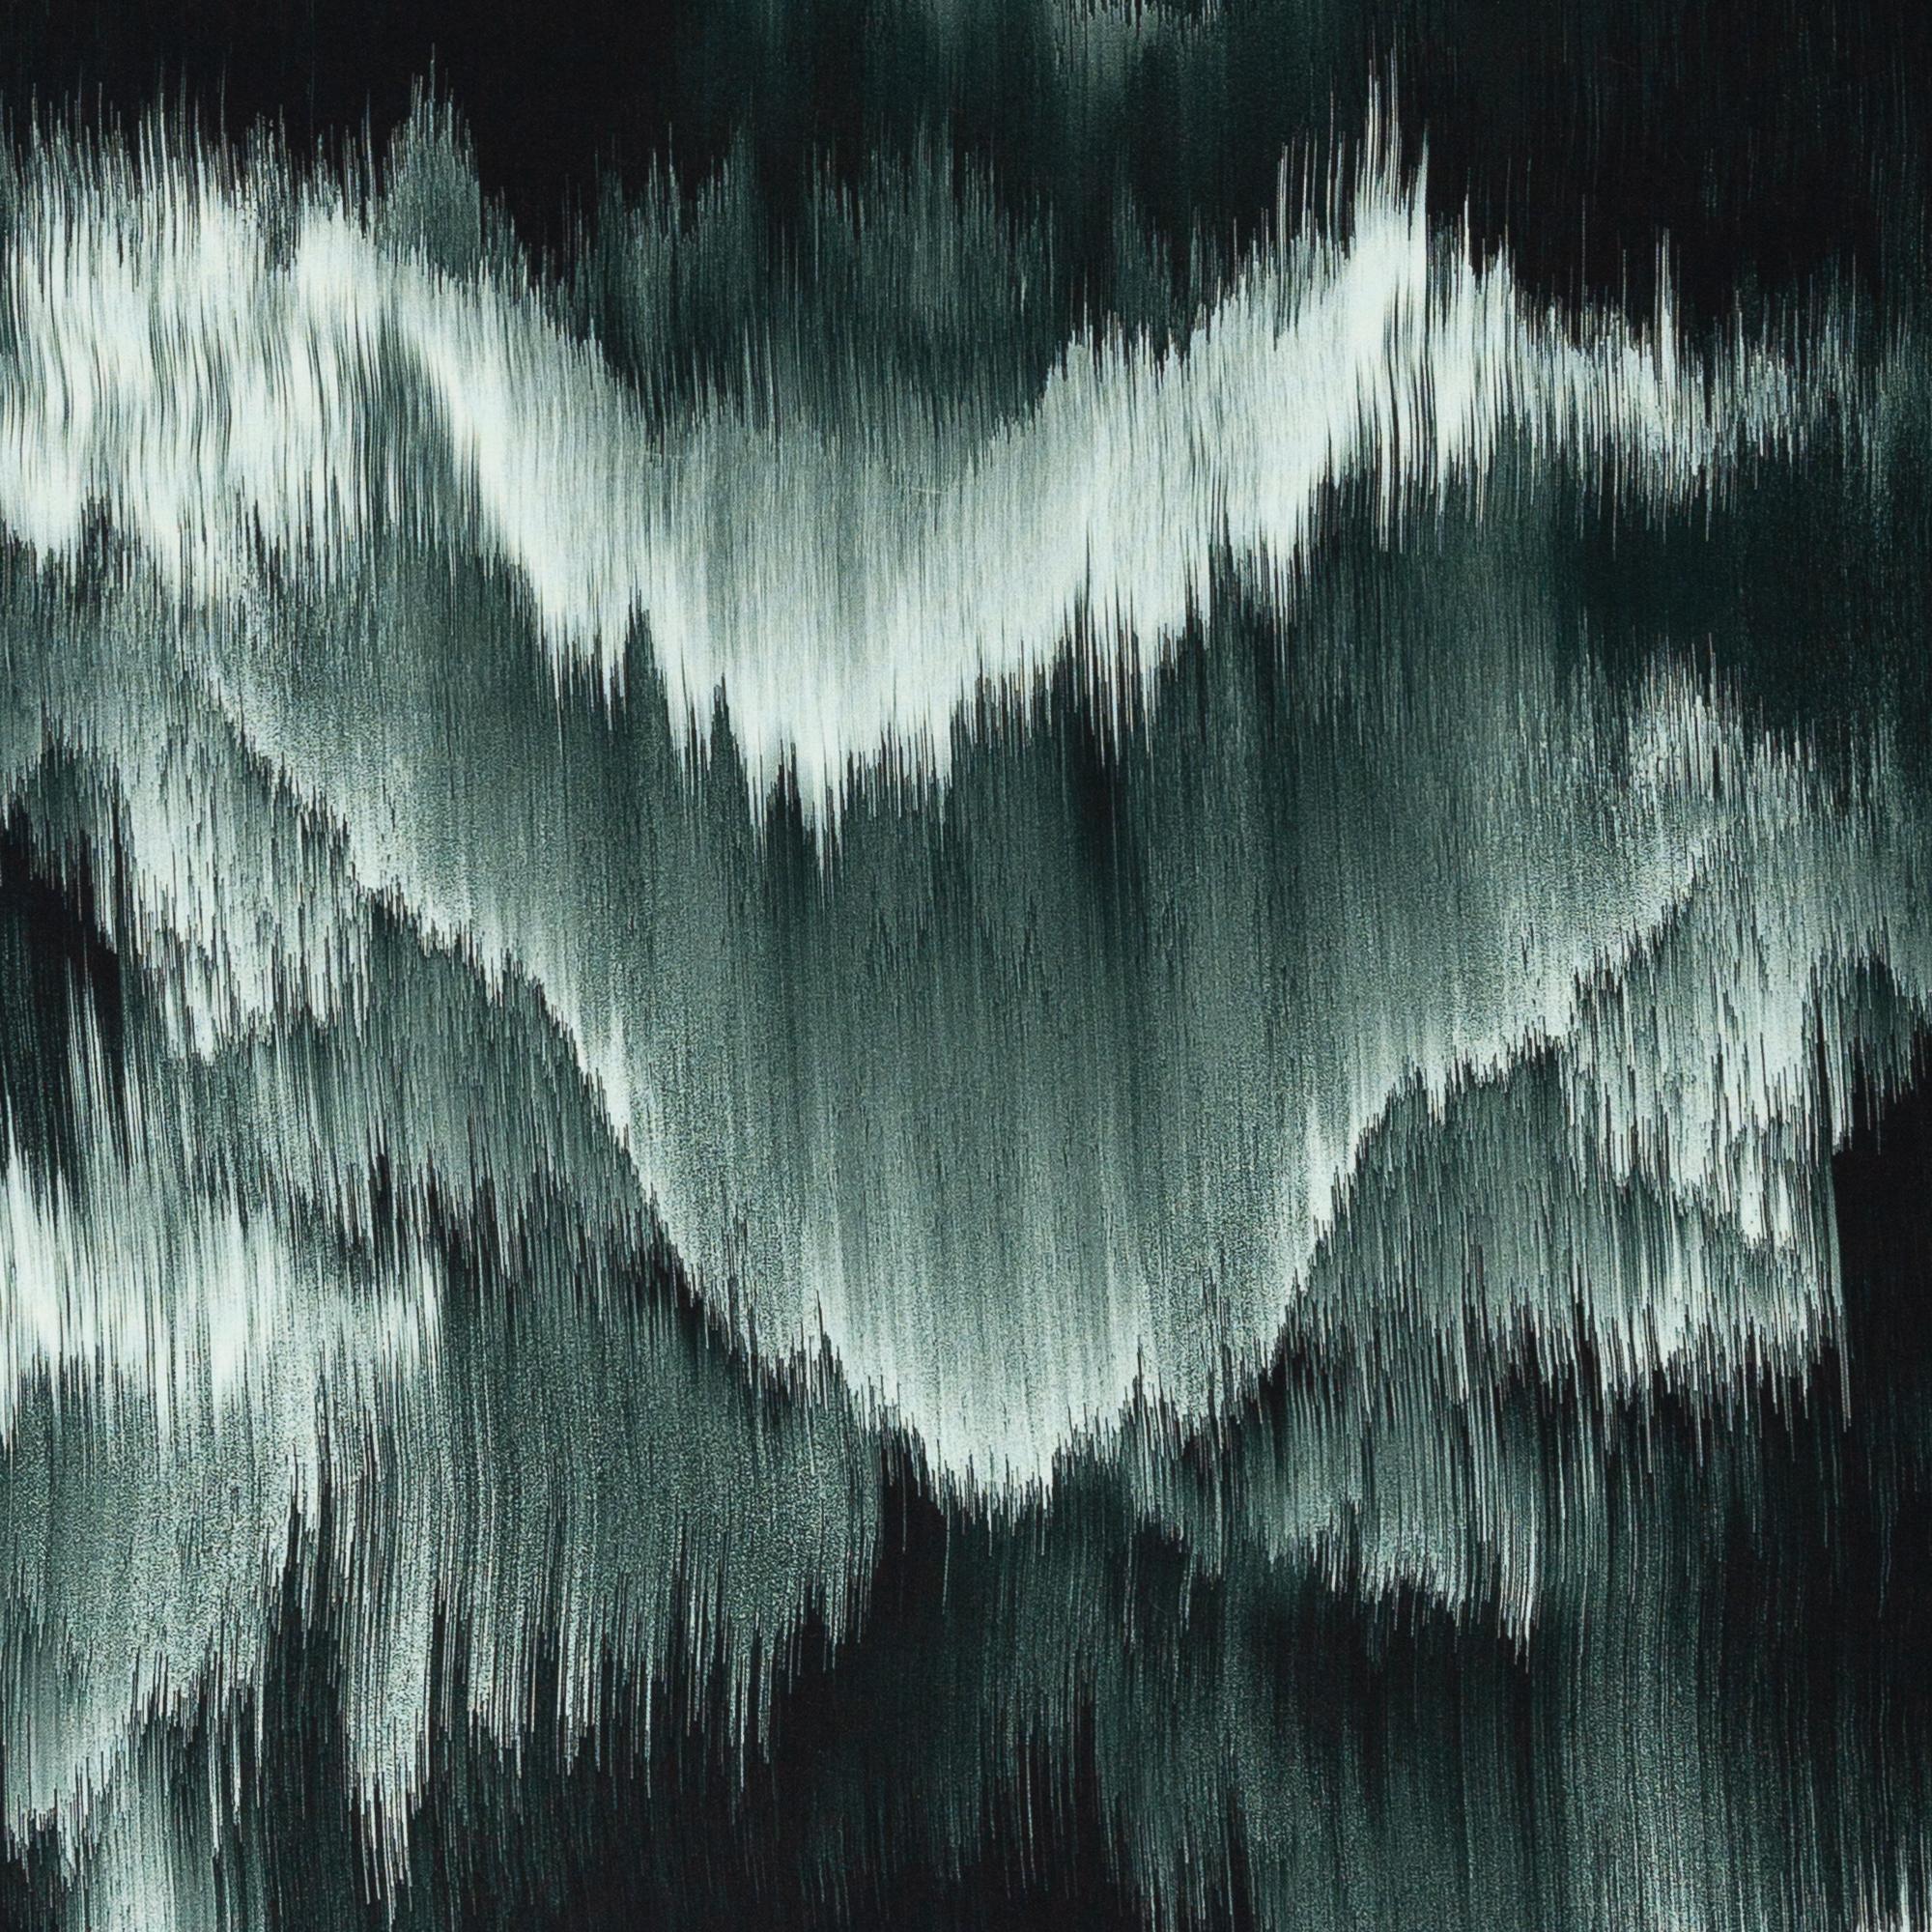 Viskose - Viskosewebware - Swafing - Dripstones by Thorsten Berger - Muster in Grüntöne